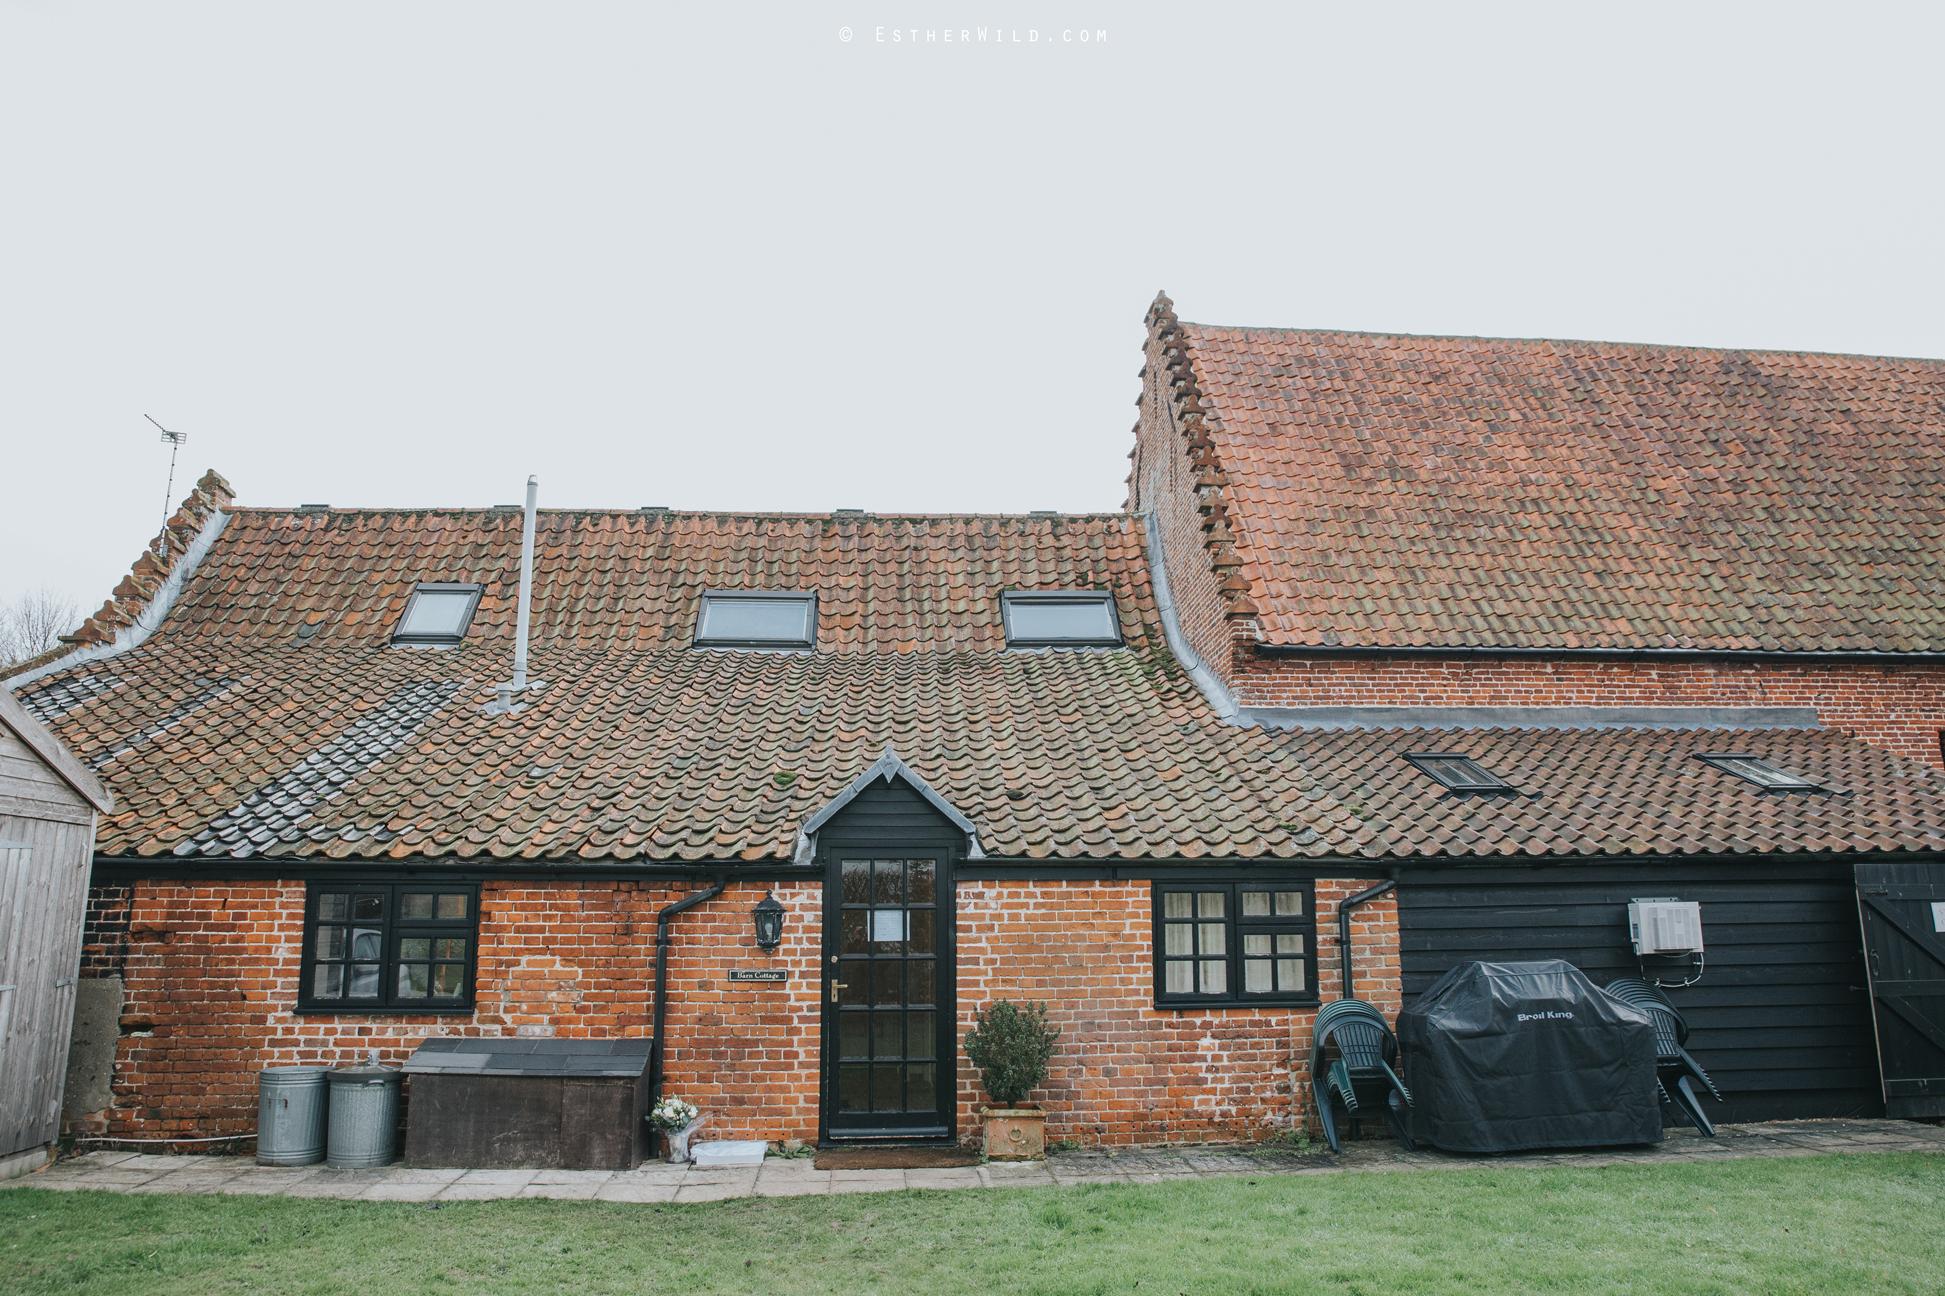 Elms_Barn_Weddings_Suffolk_Photographer_Copyright_Esther_Wild_IMG_0216.jpg